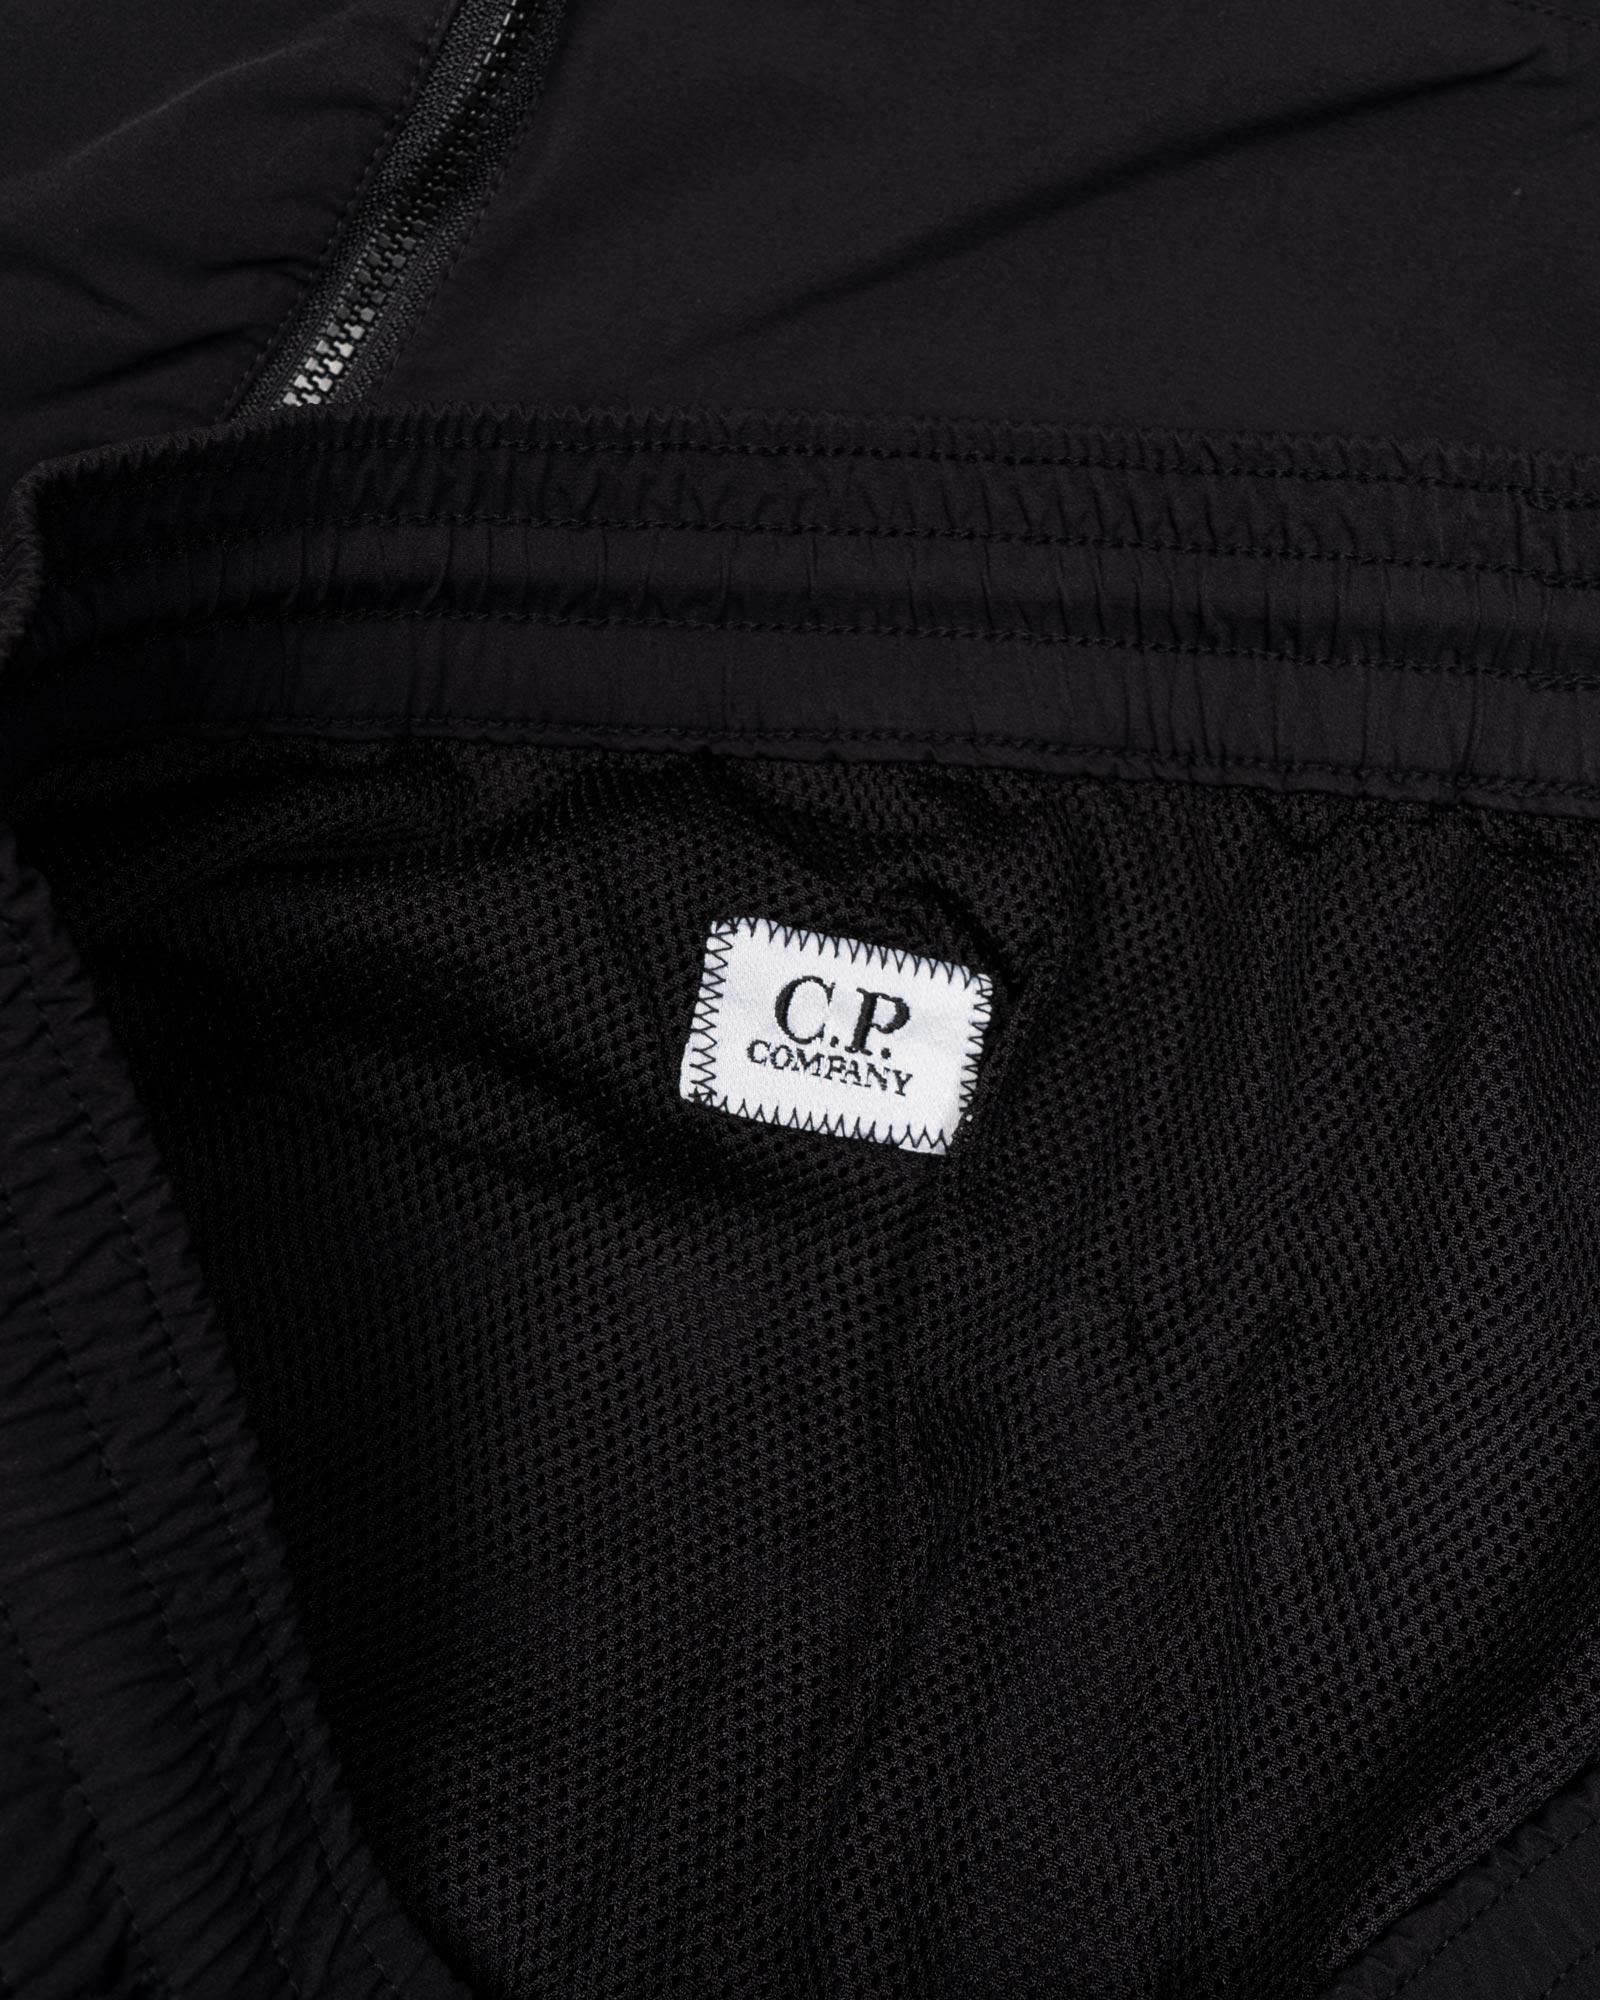 Мужские спортивные брюки C.P.Company Garment Dyed Stretch Nylon Loose Fit Lens Pants